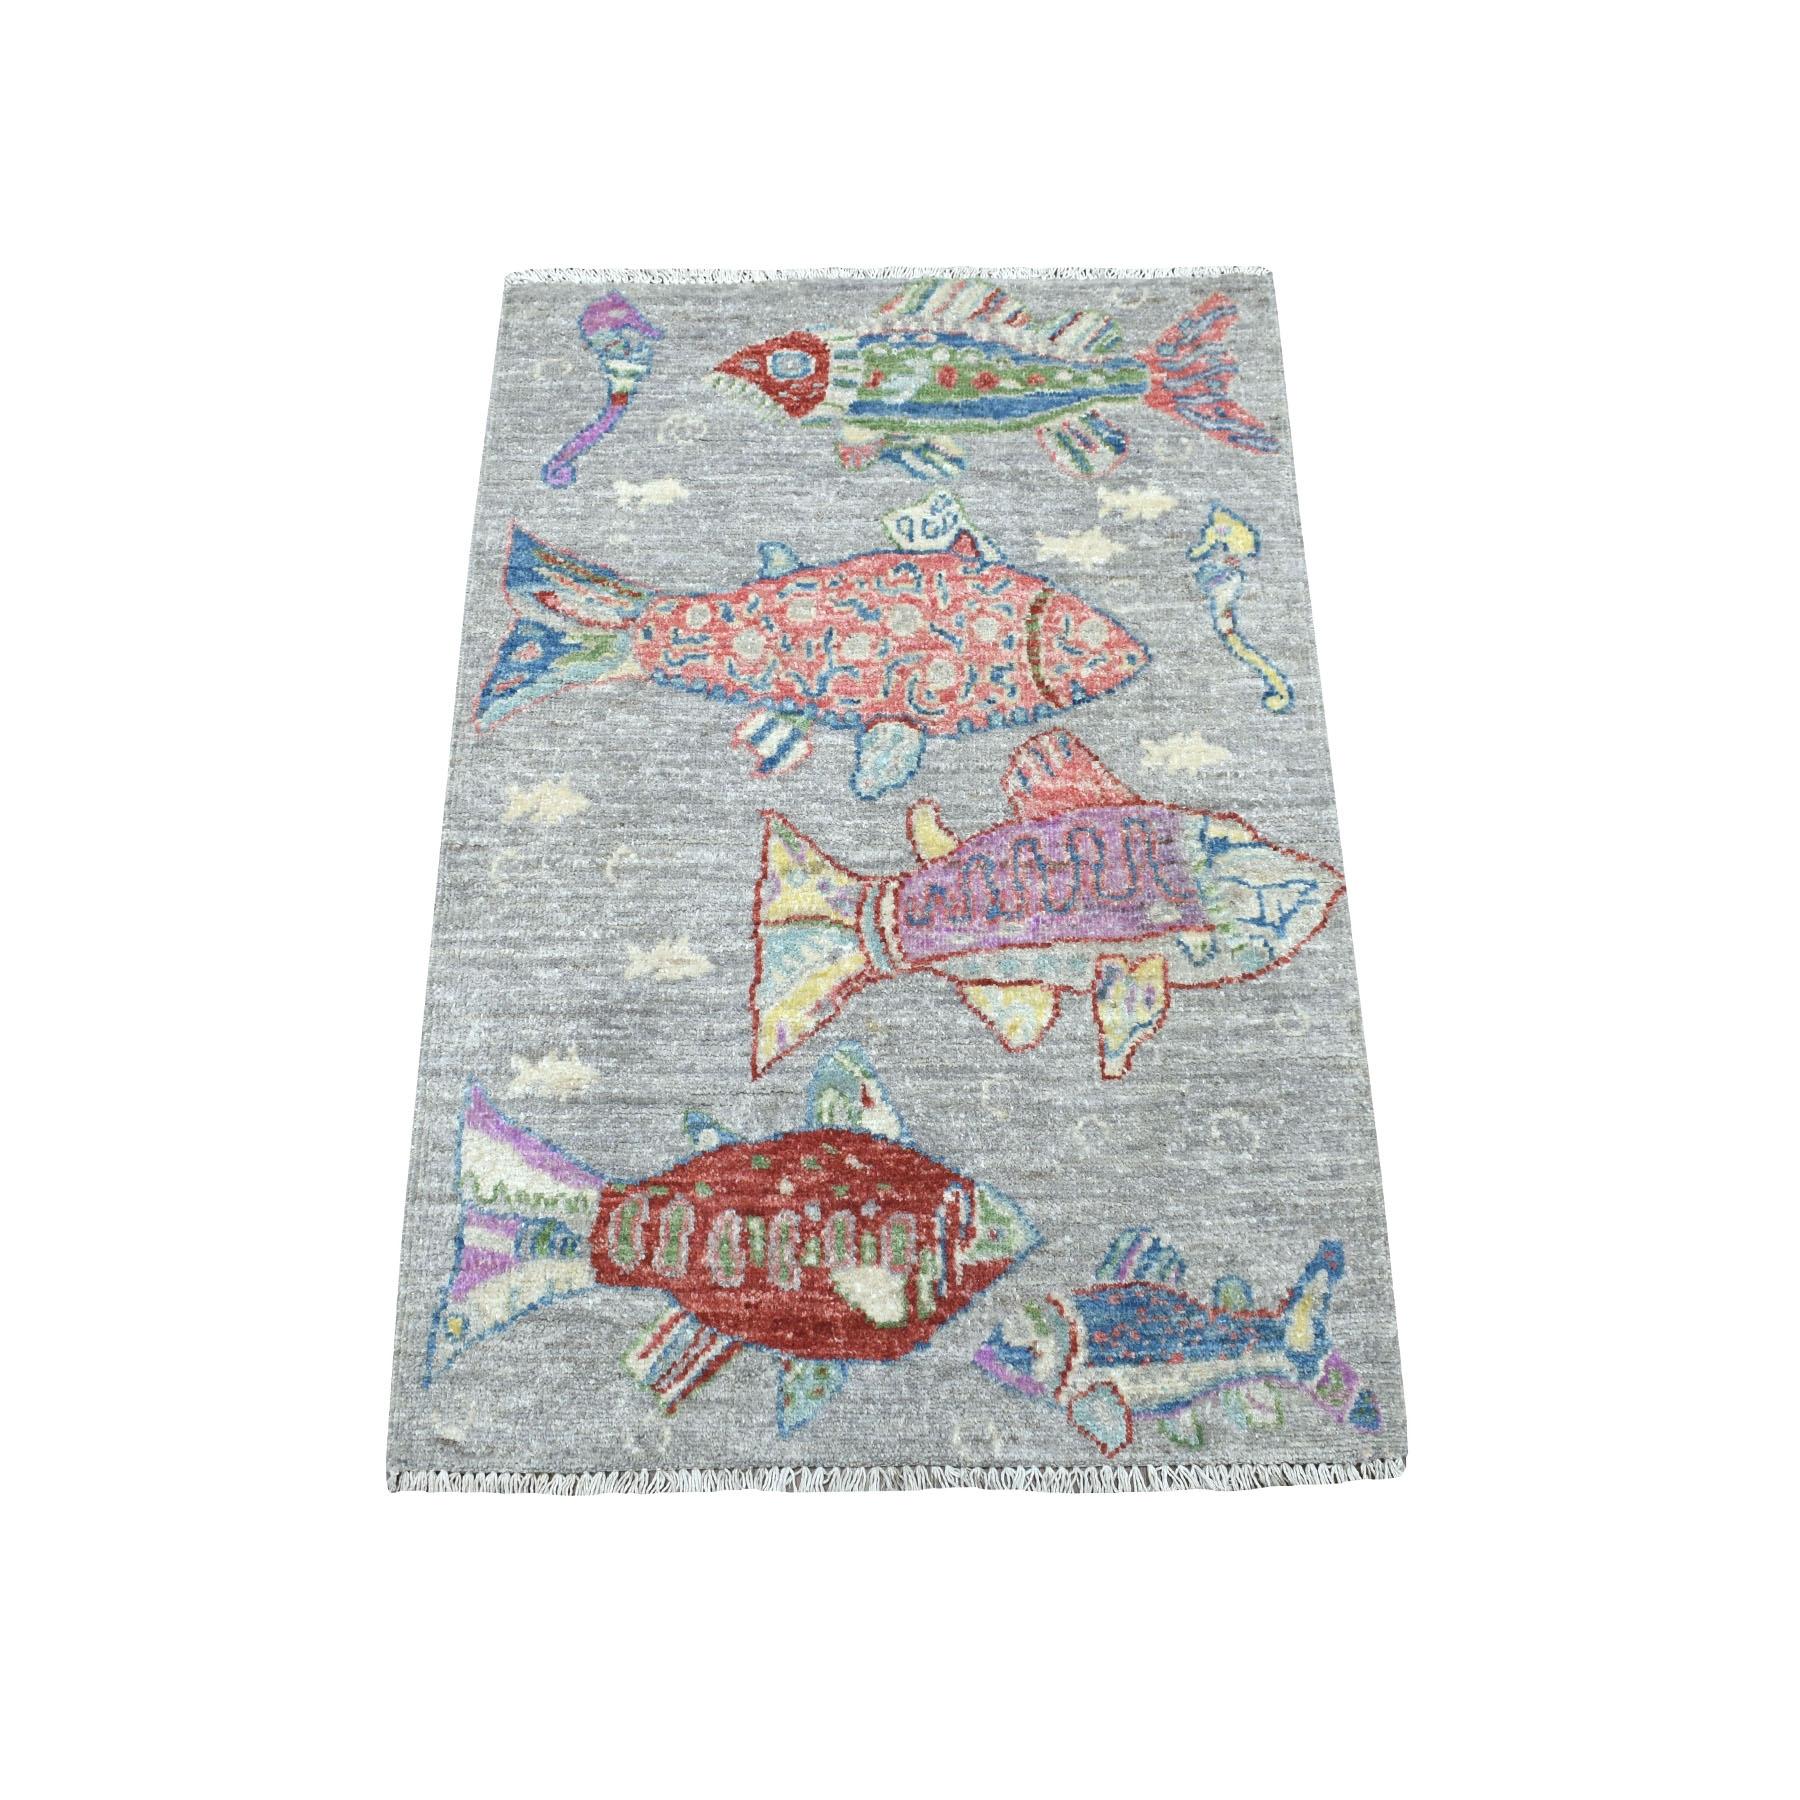 2'X3' Oceanic Fish Design Pure Wool Peshawar Hand Knotted Oriental Rug moaecc8b